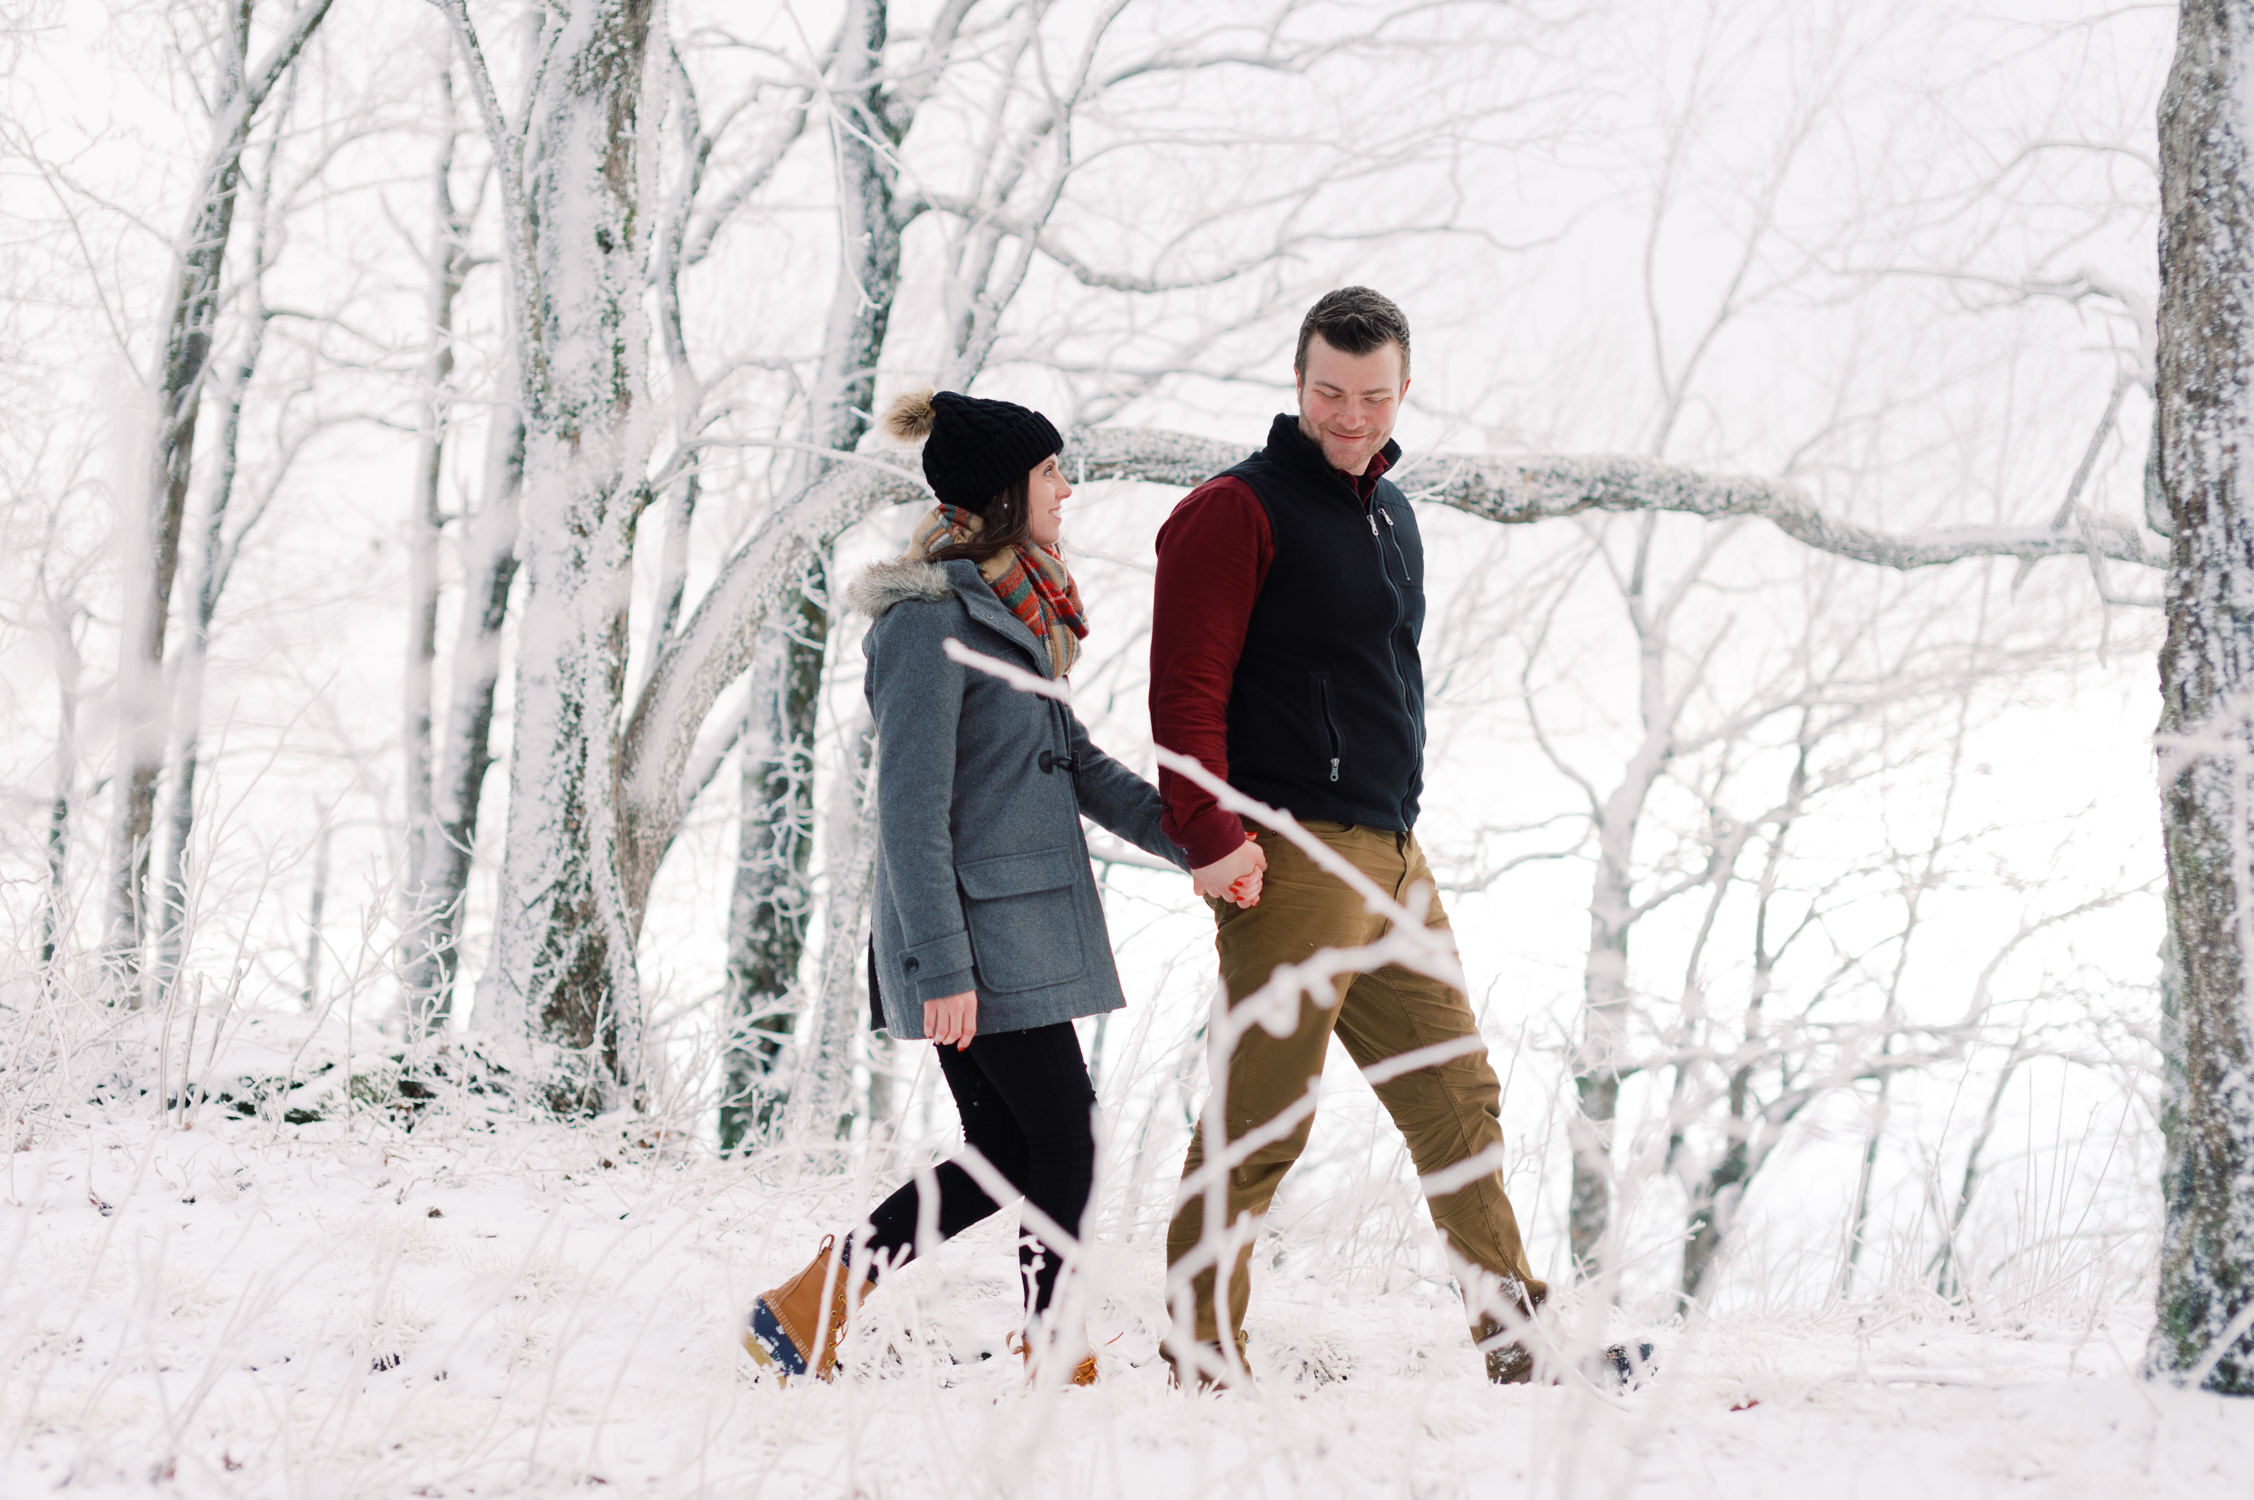 snowy-georgia-proposal-preachers-rock-atlanta-dahlonega-wedding-photographer-hannah-forsberg-fine-art-film-34.jpg